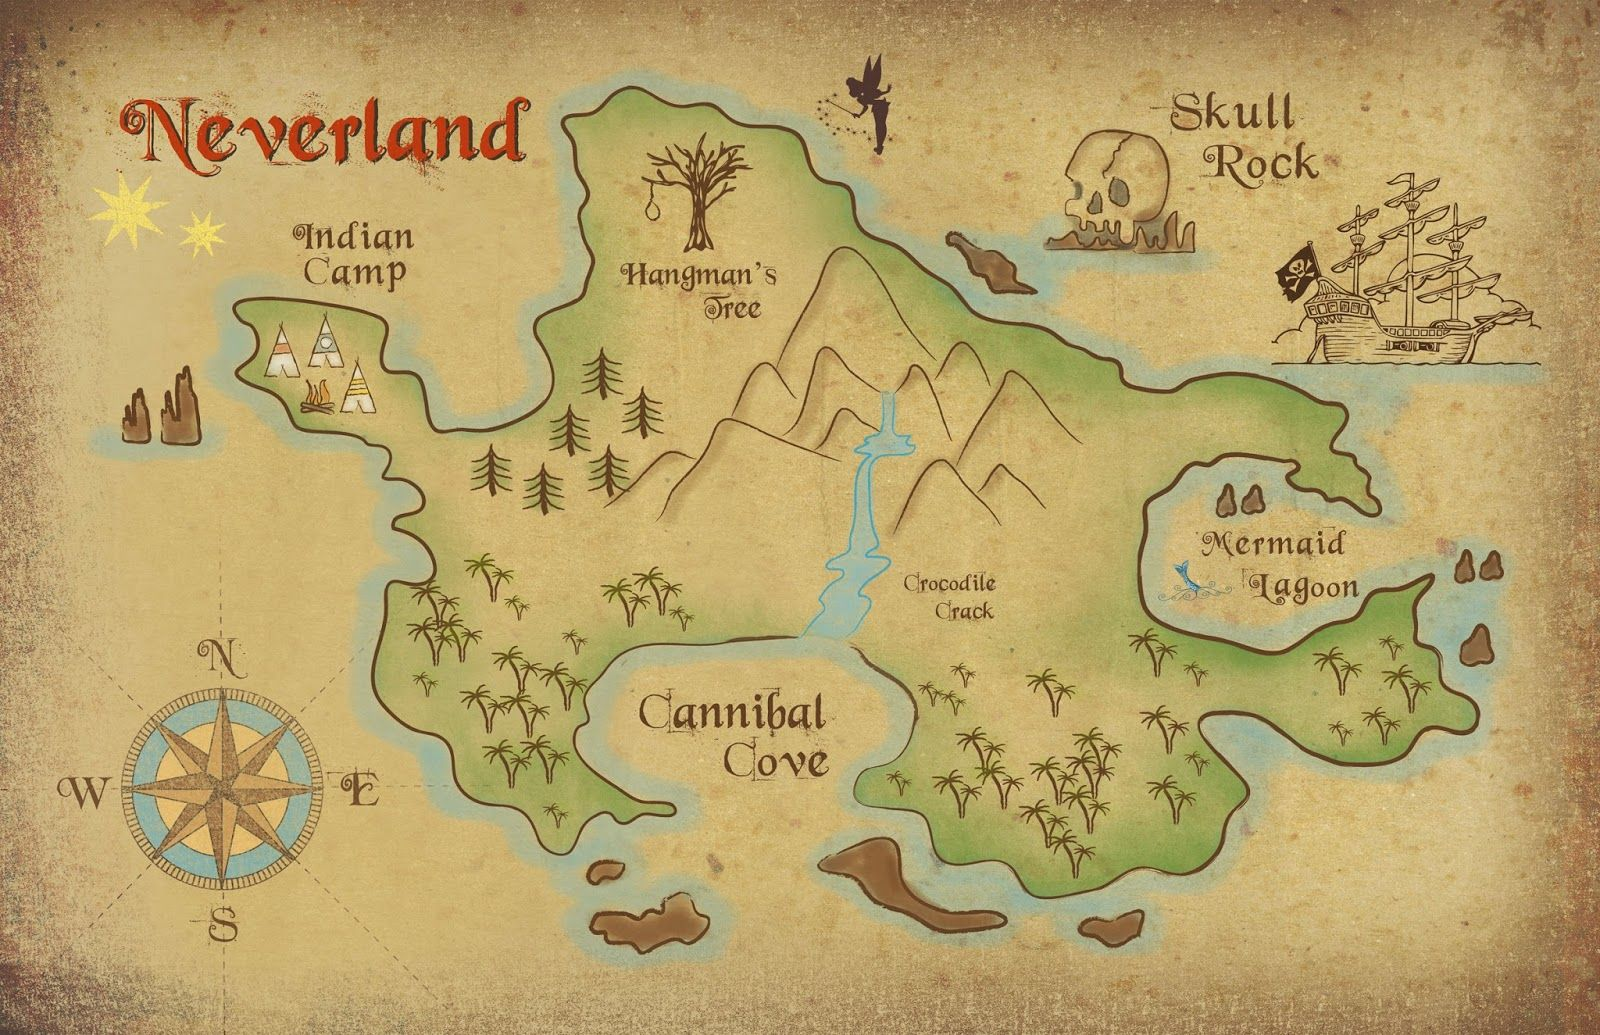 Map Of Neverland Neverland map download | #DisneySide Parties   Peter Pan | Peter